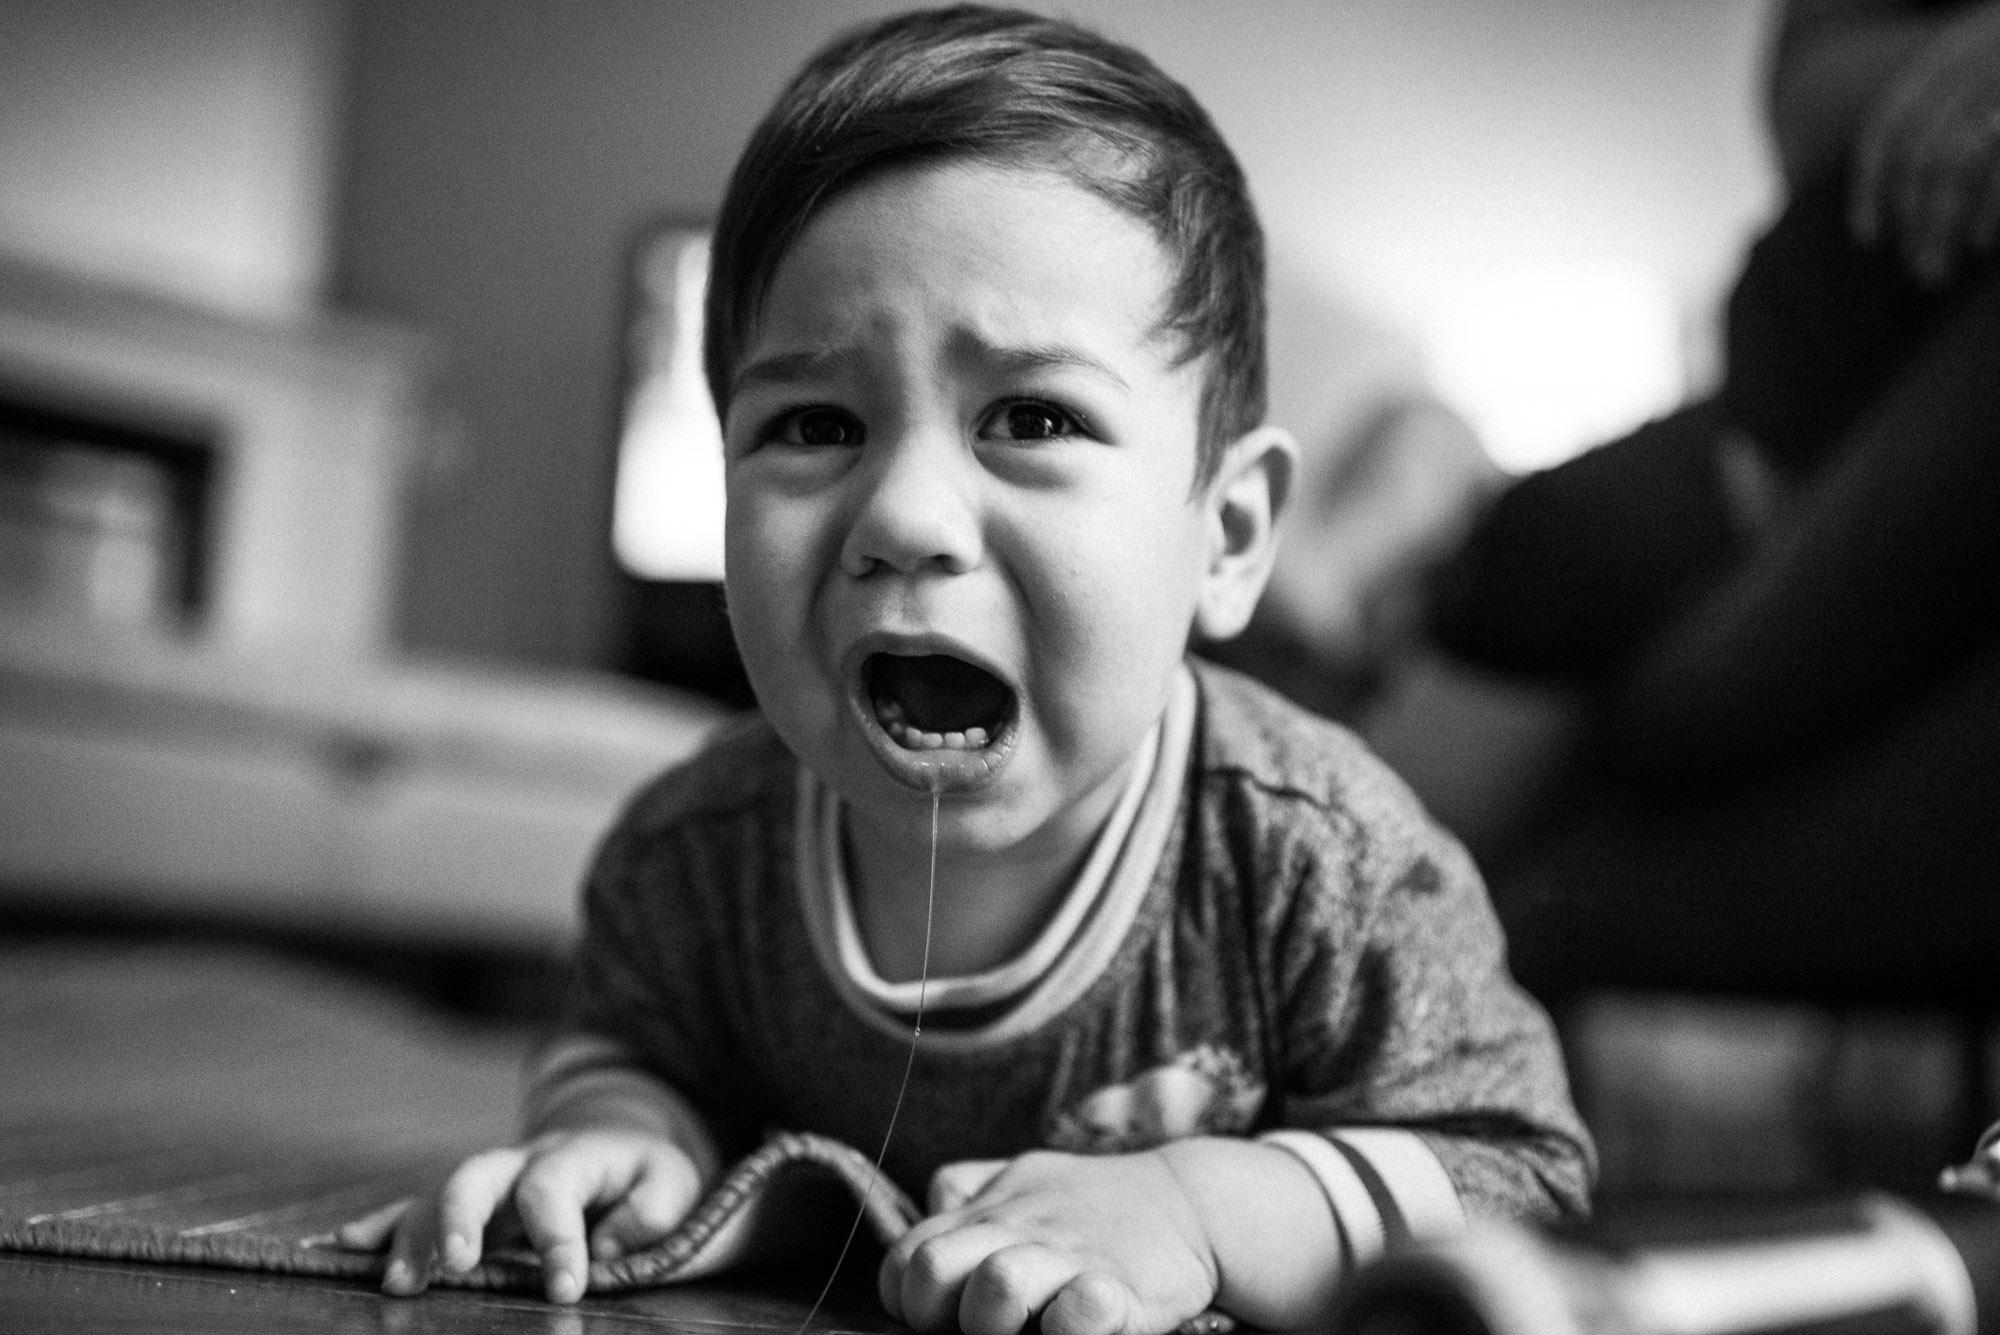 toddler scrunches carpet during a tantrum